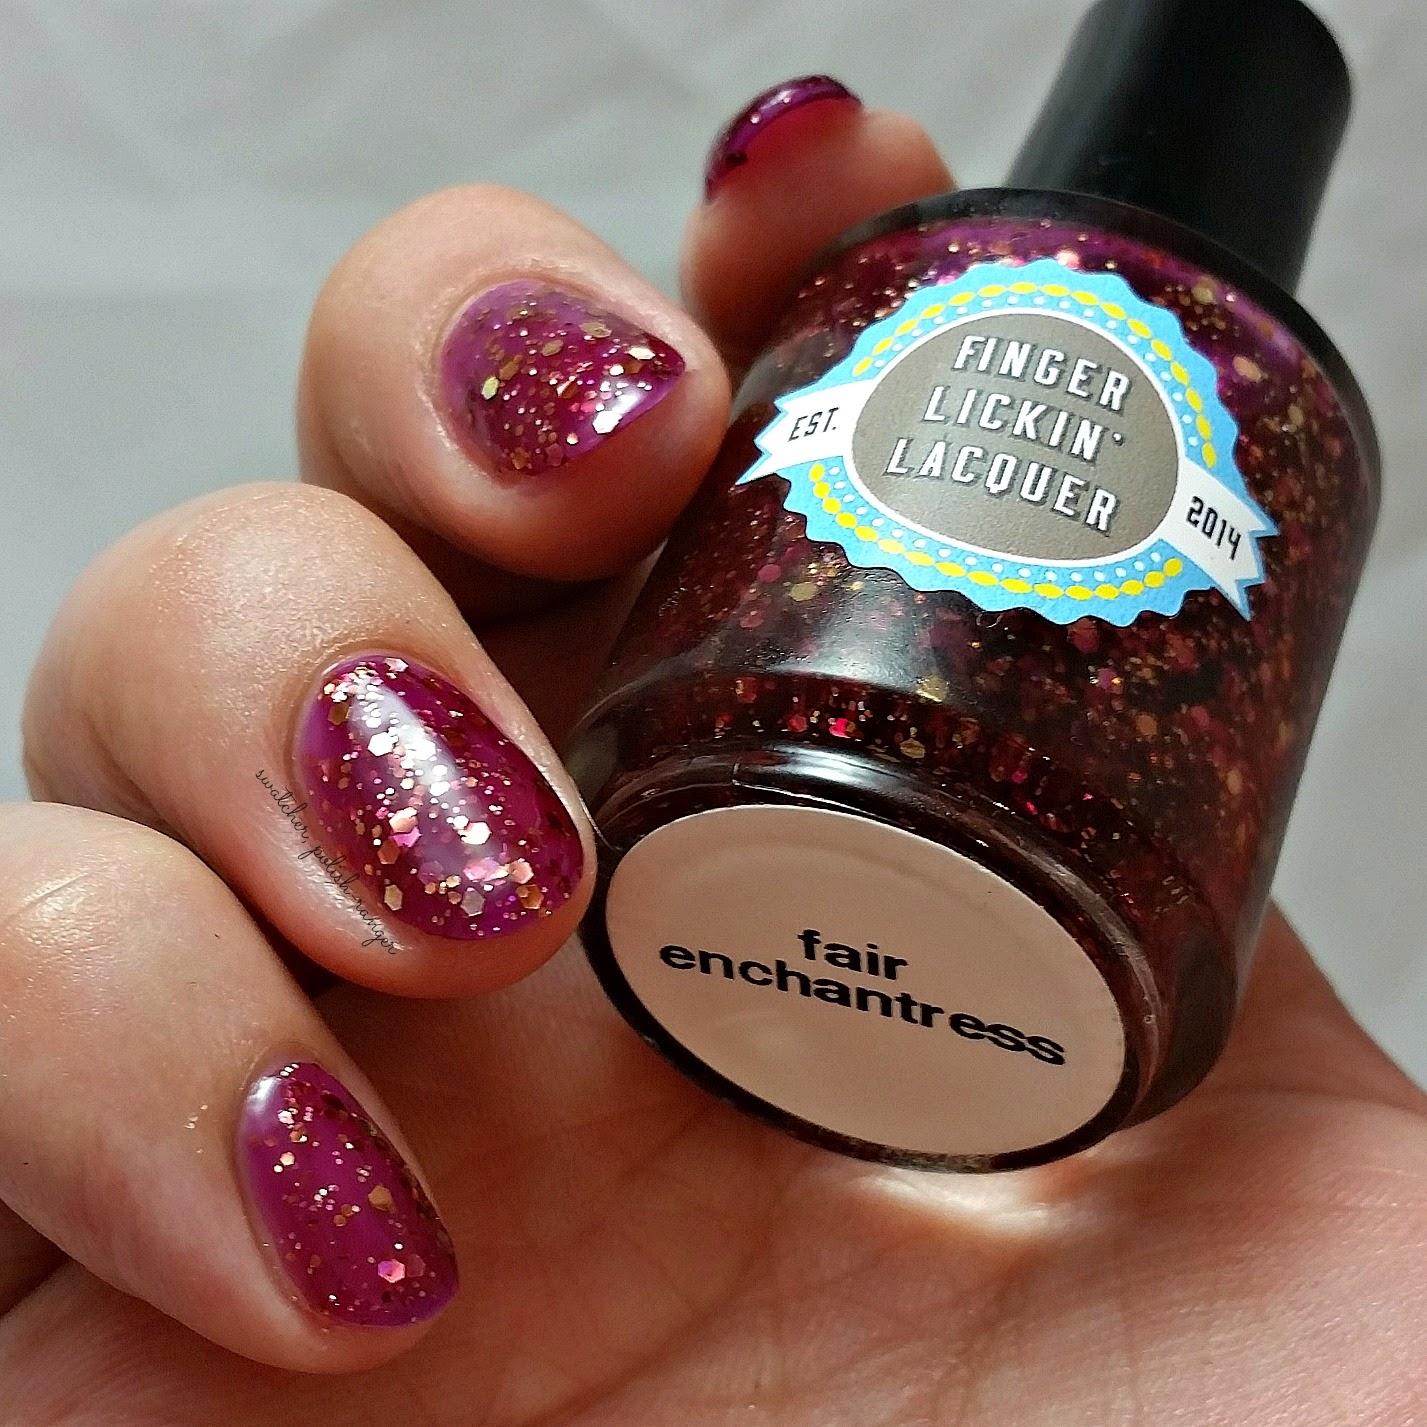 swatcher, polish-ranger | Finger Lickin Lacquer Fair Enchantress swatch